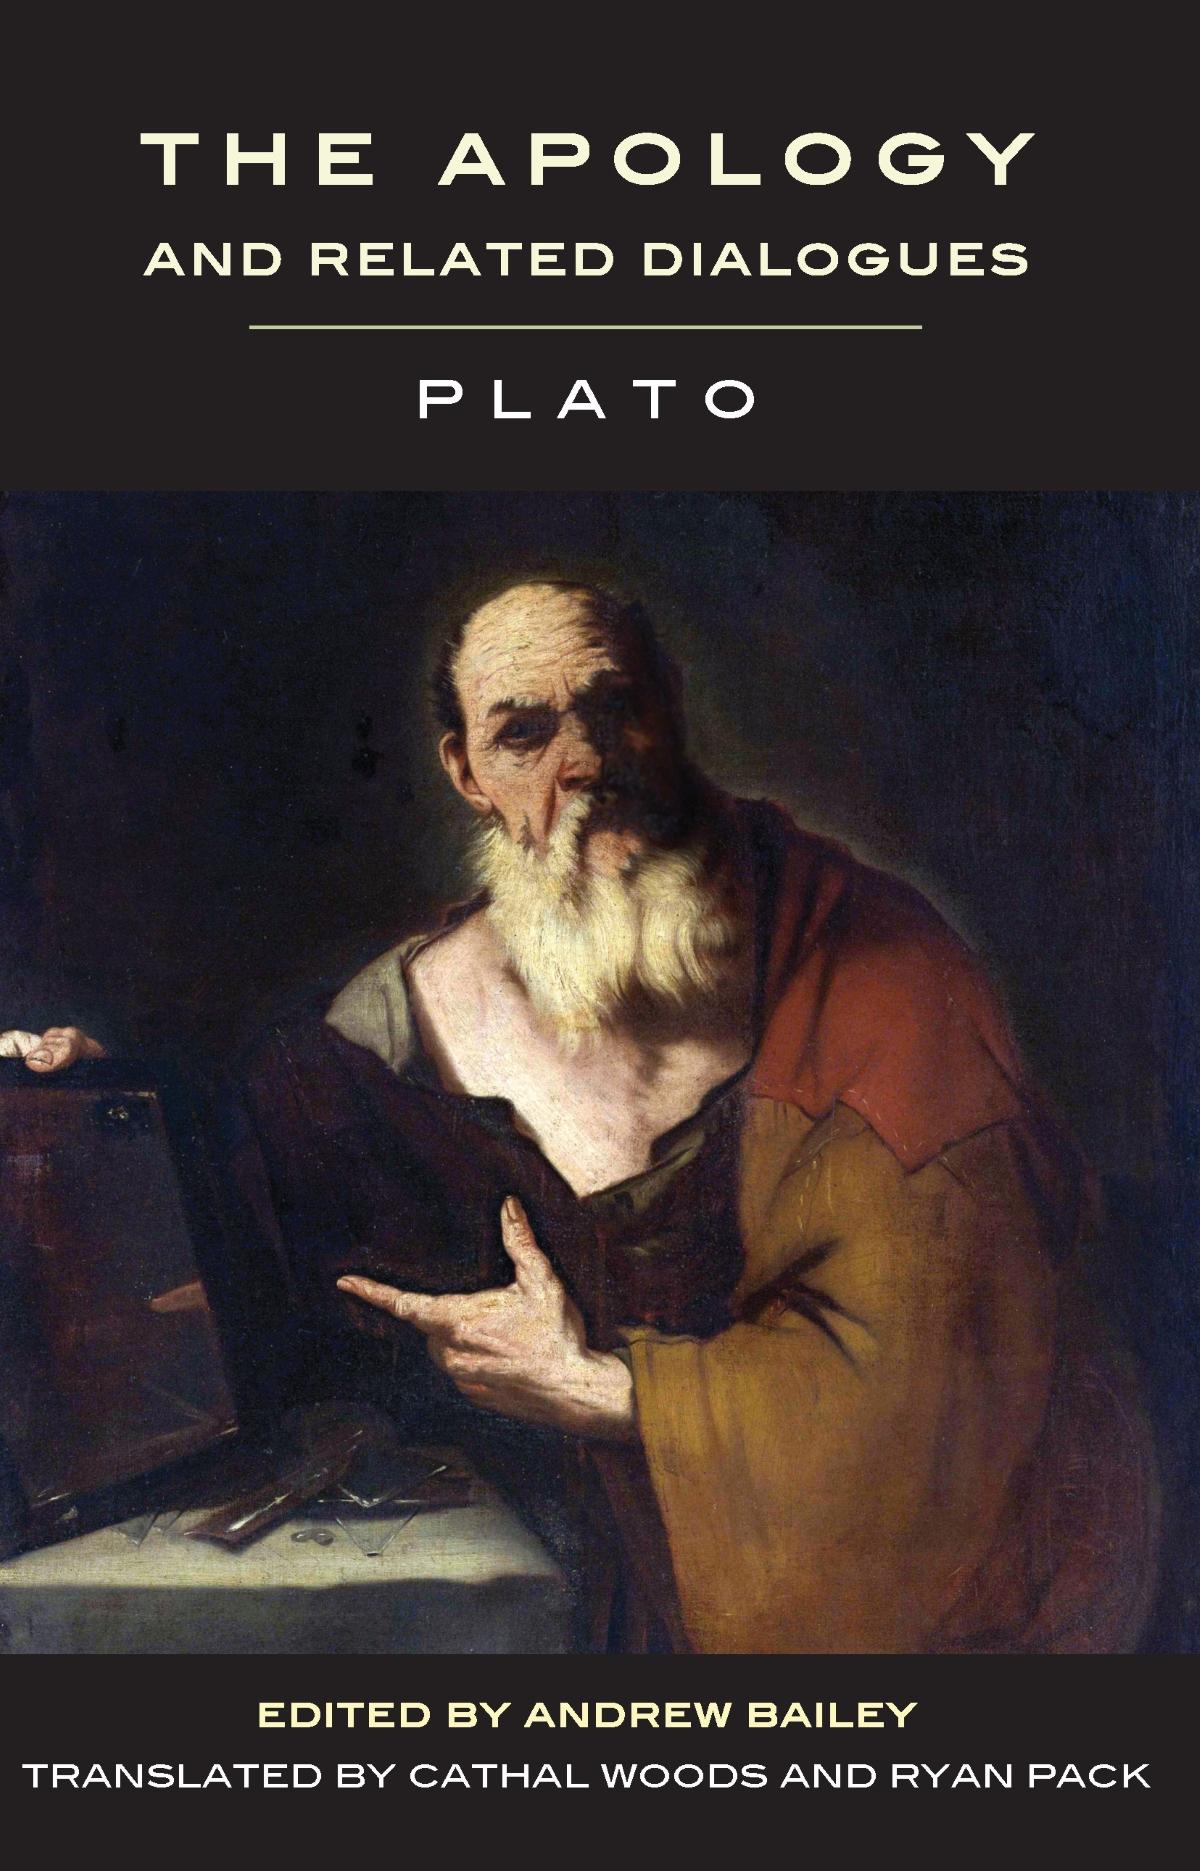 plato and socrates anthology